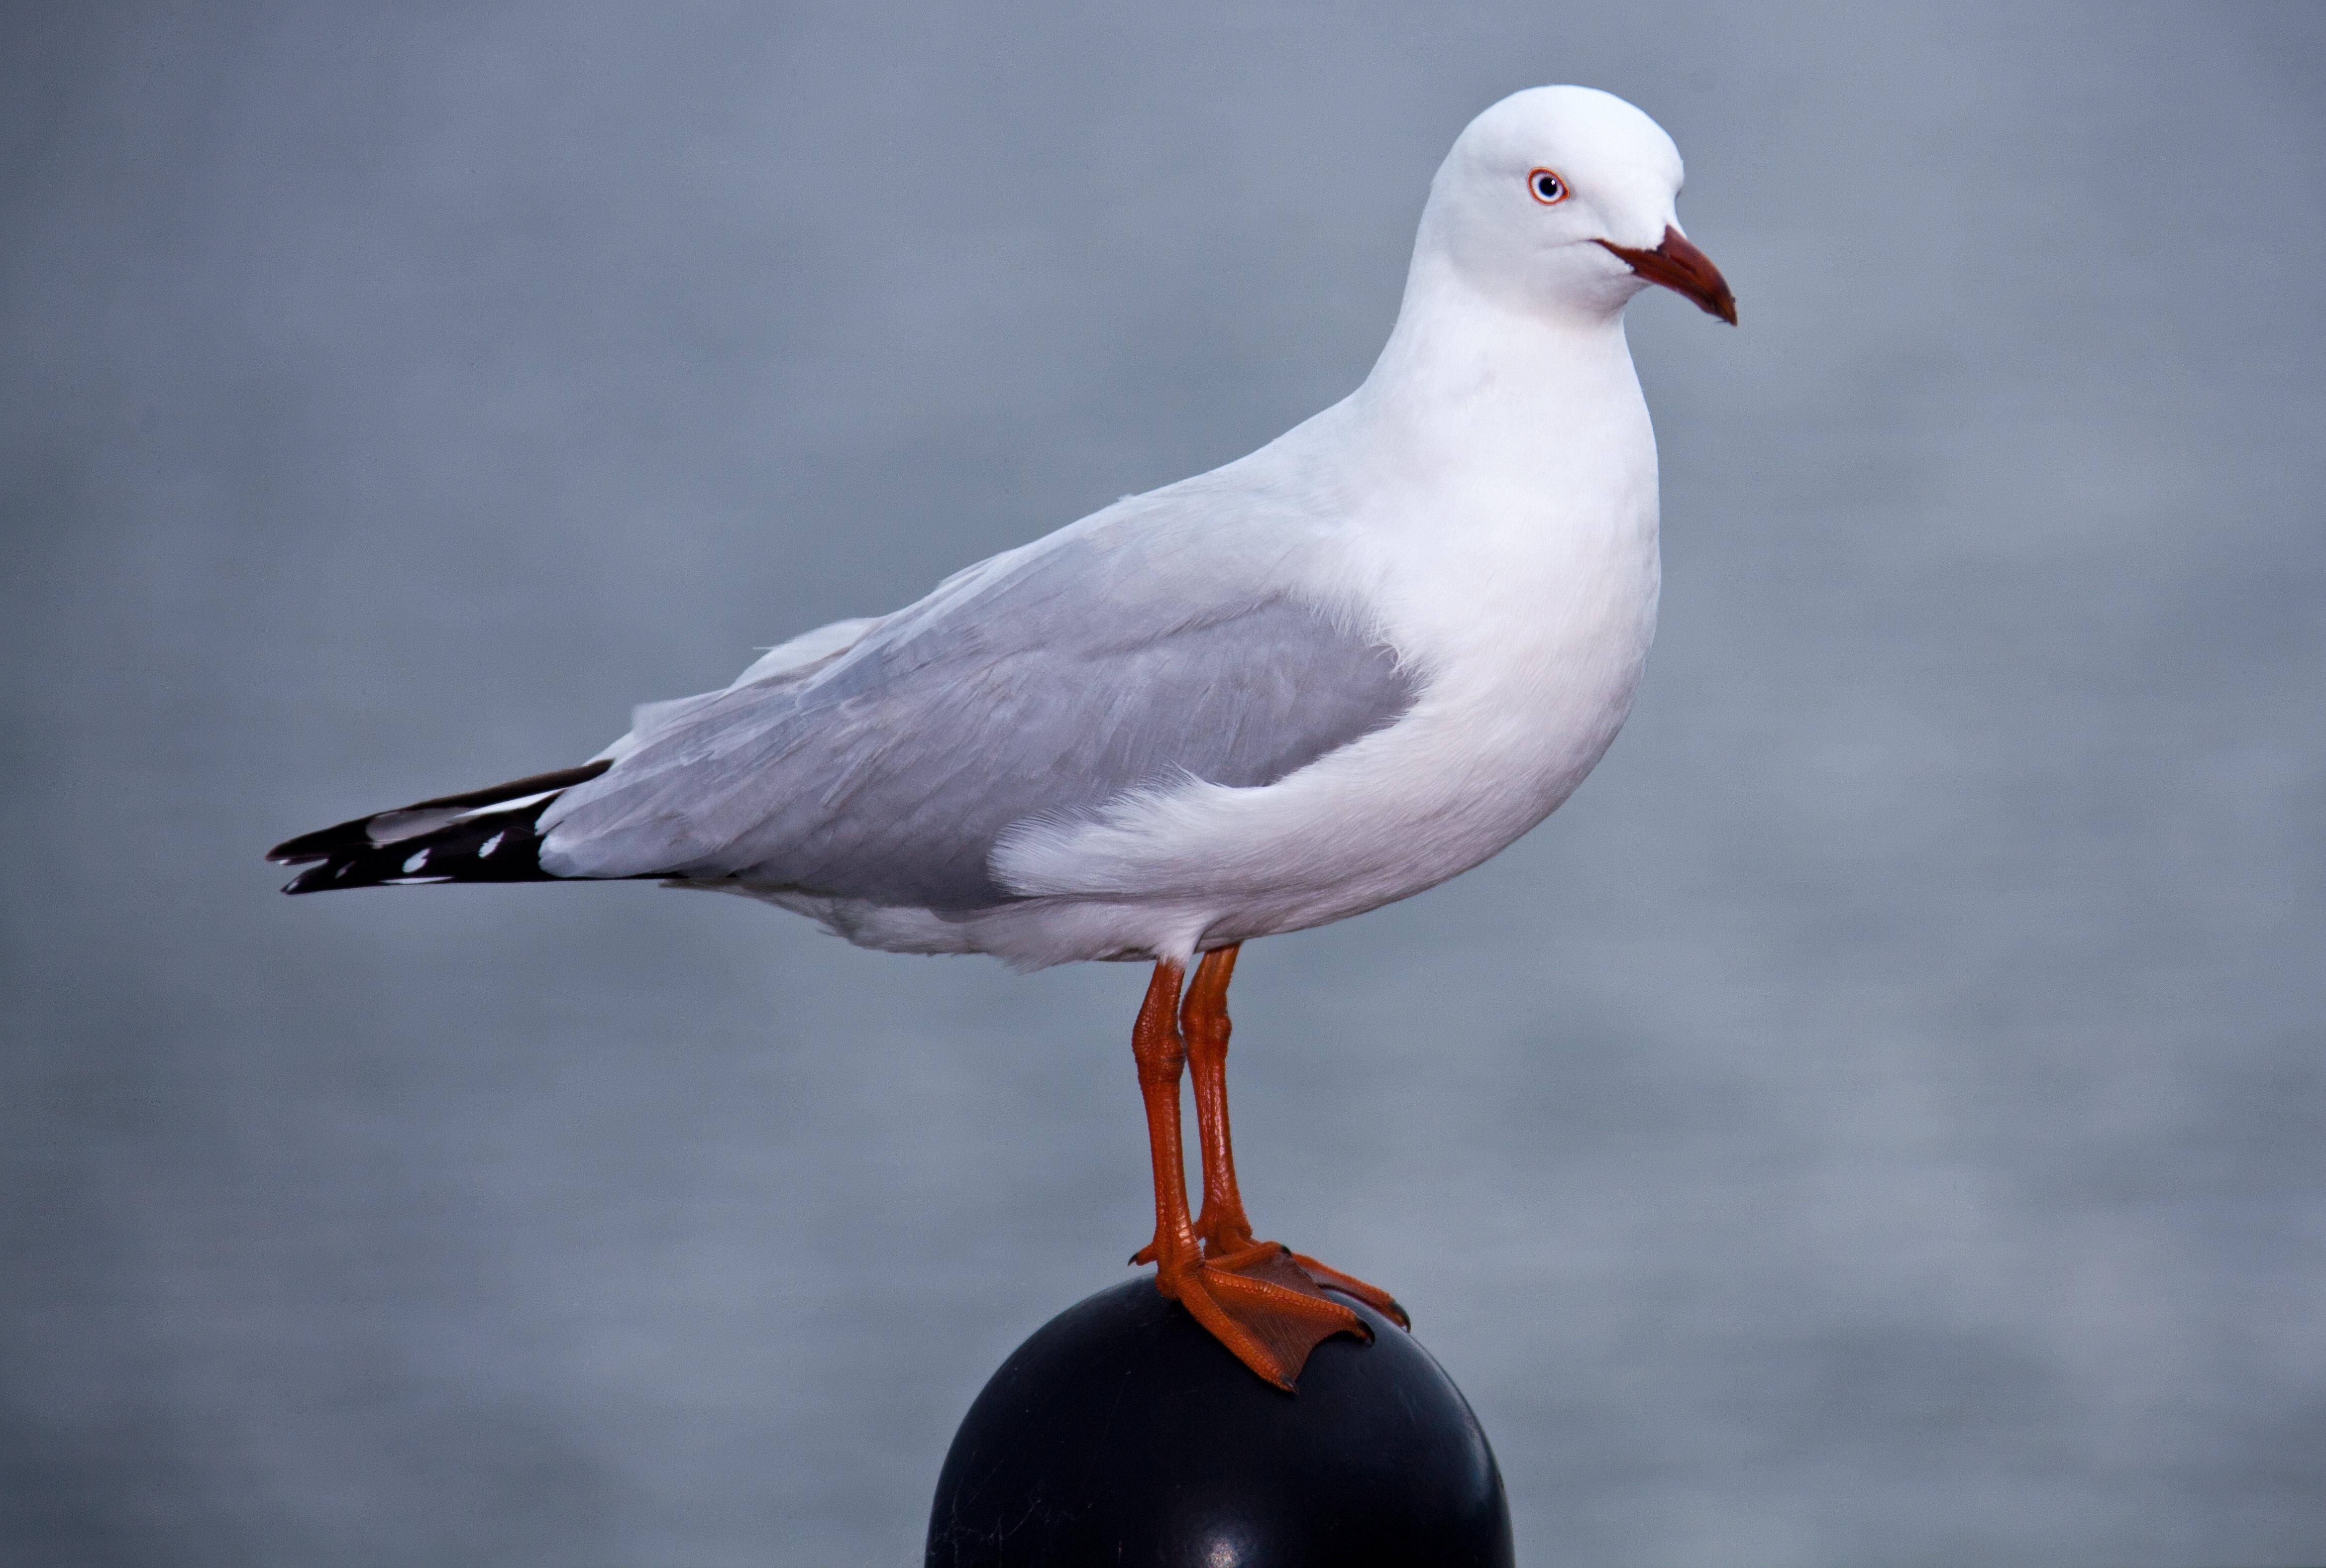 Silver Gull (Chroicocephalus [Larus] novaehollandiae)